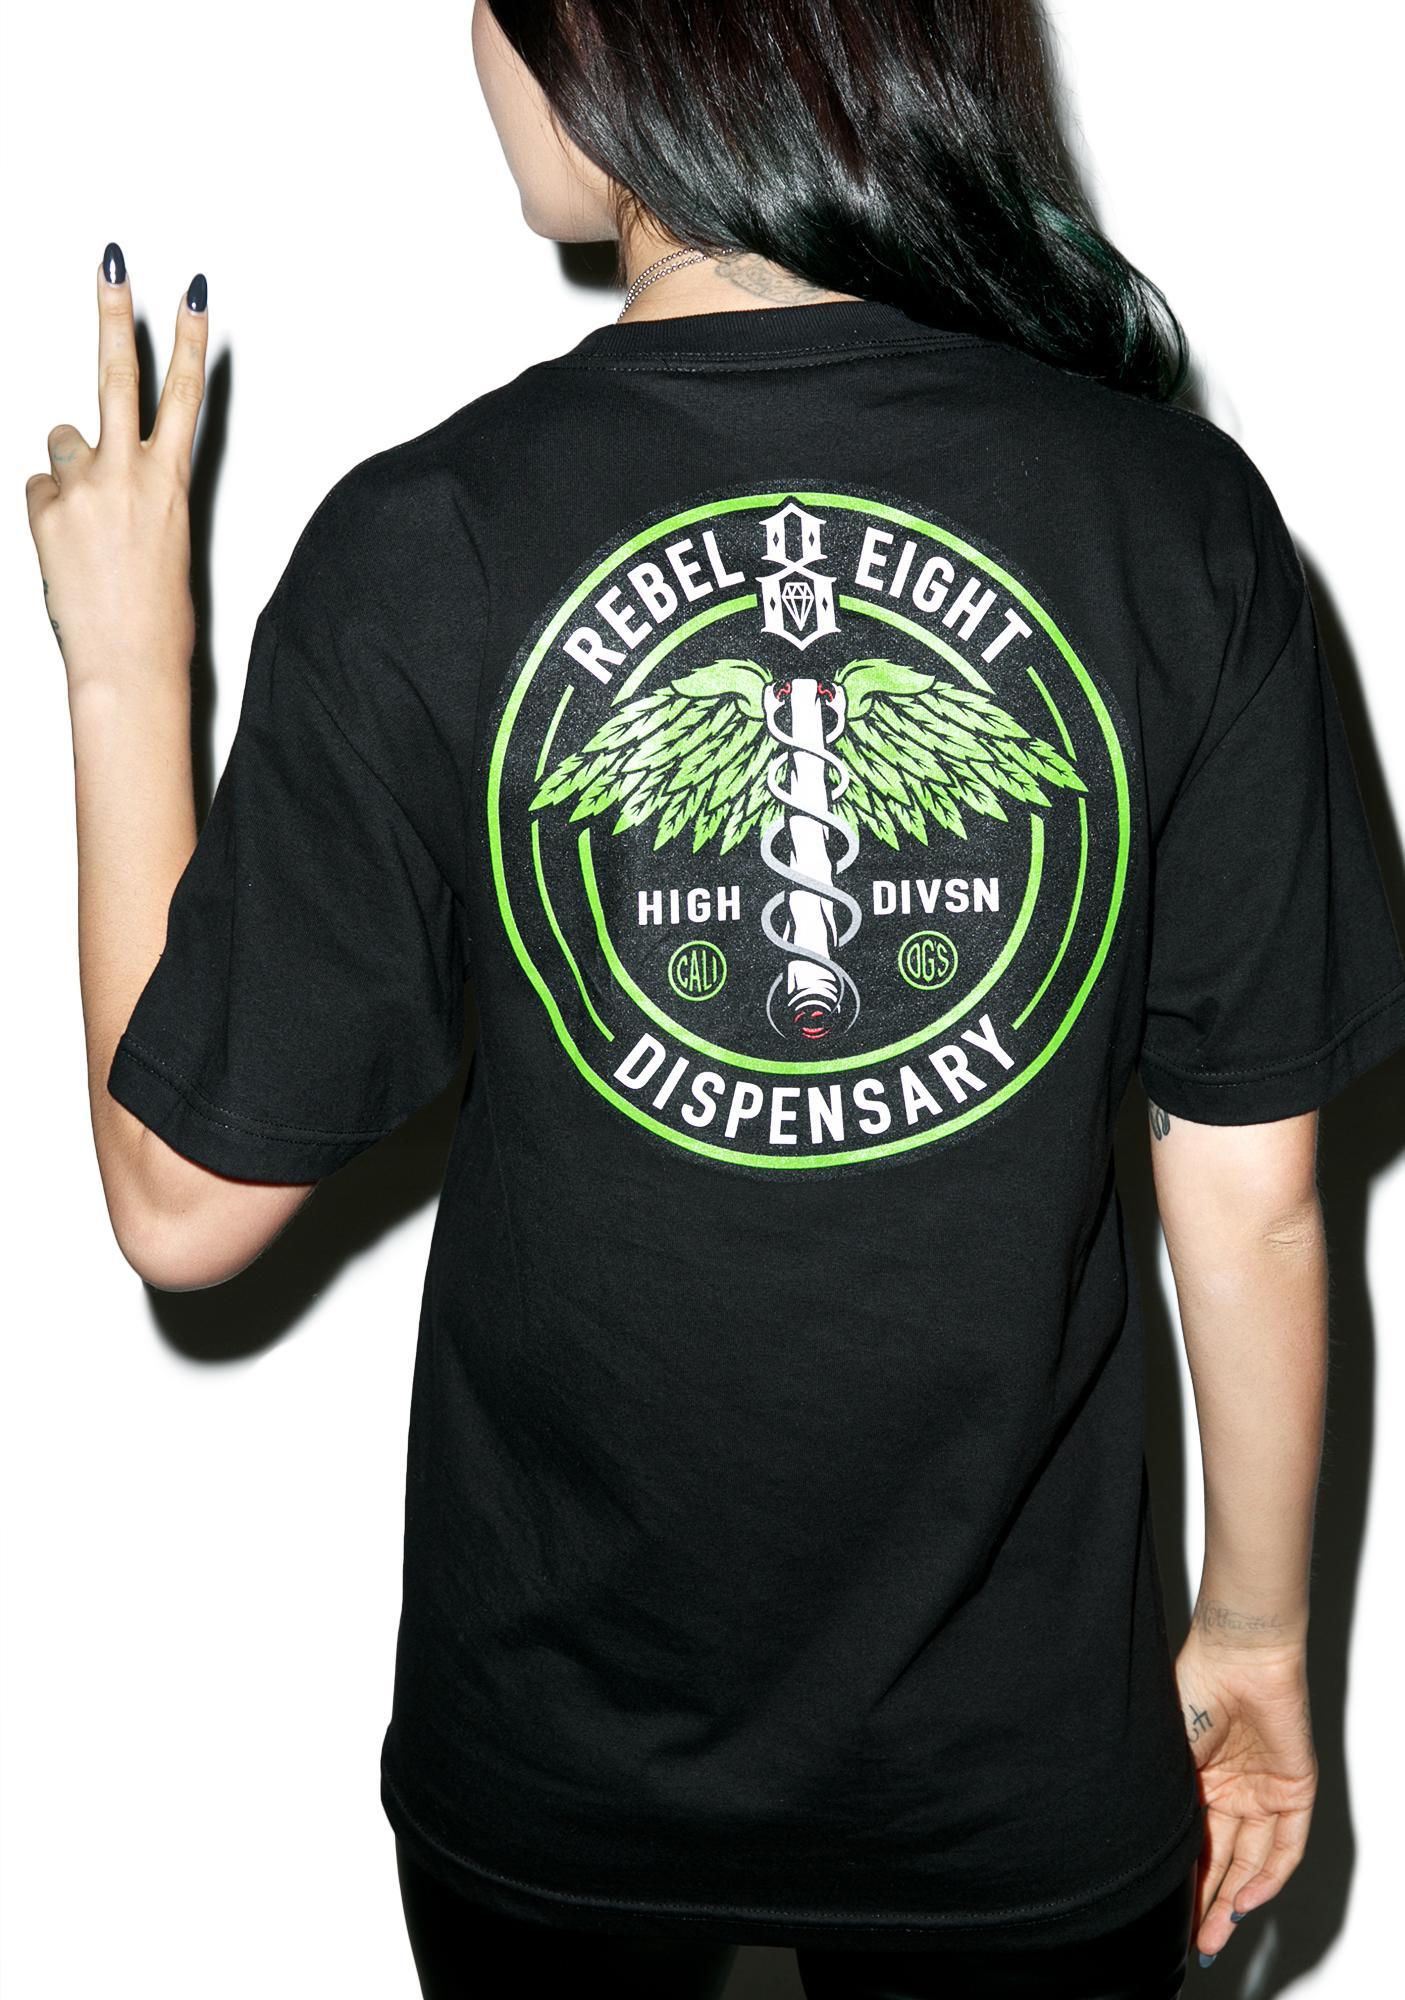 Rebel8 High Division Tee